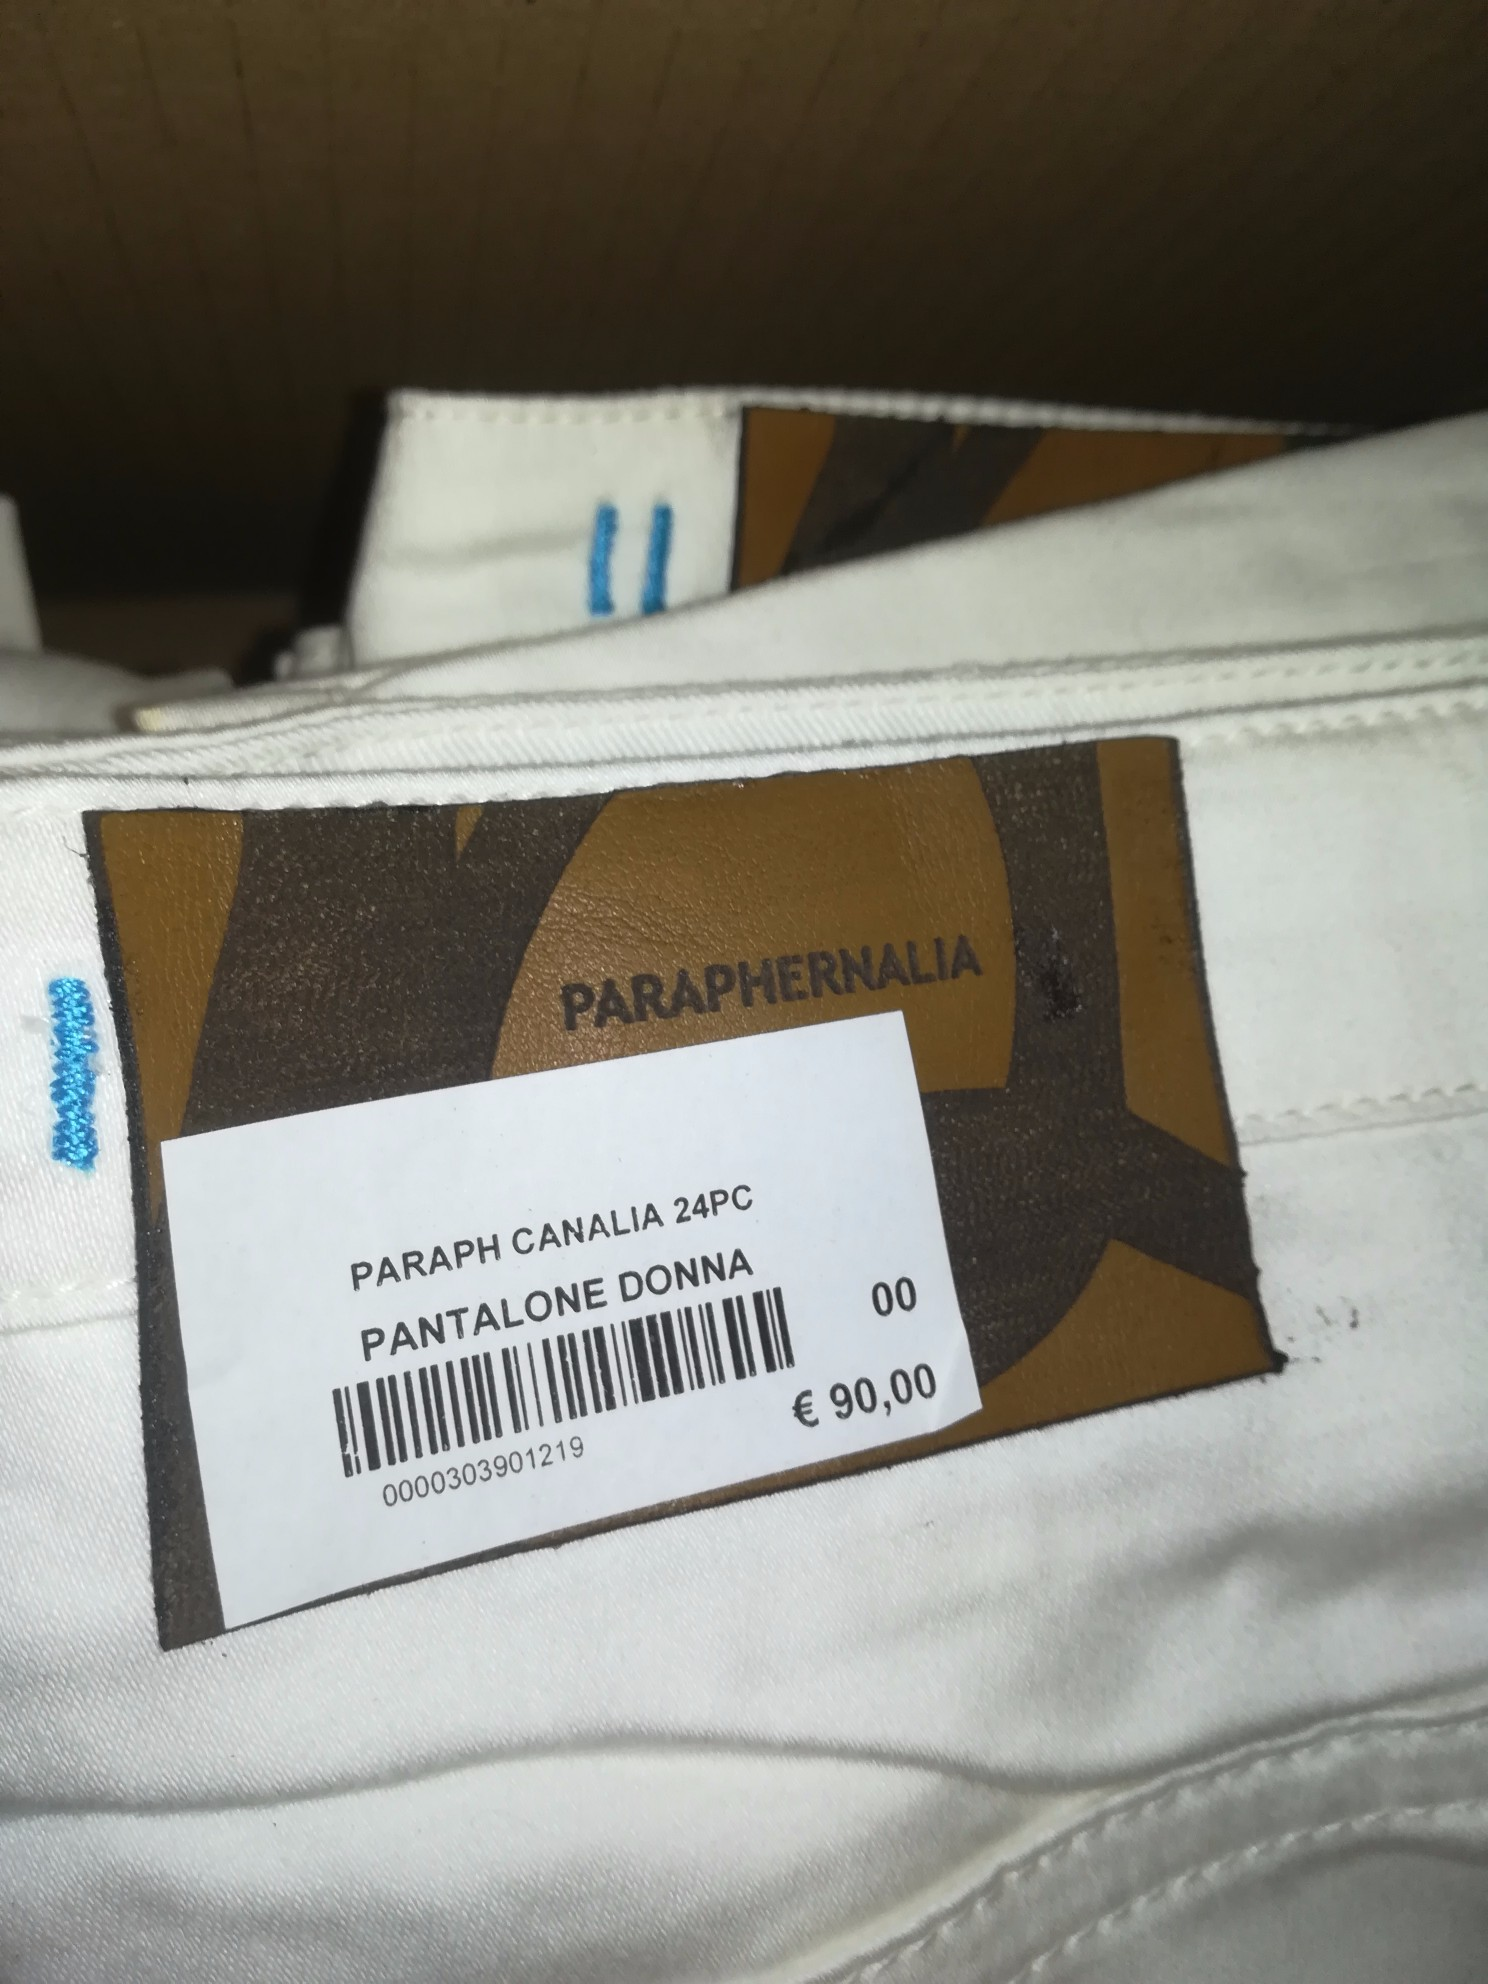 N.120 PANTALONI DONNA MARCHIO PARAPHERNALIA,N.3...